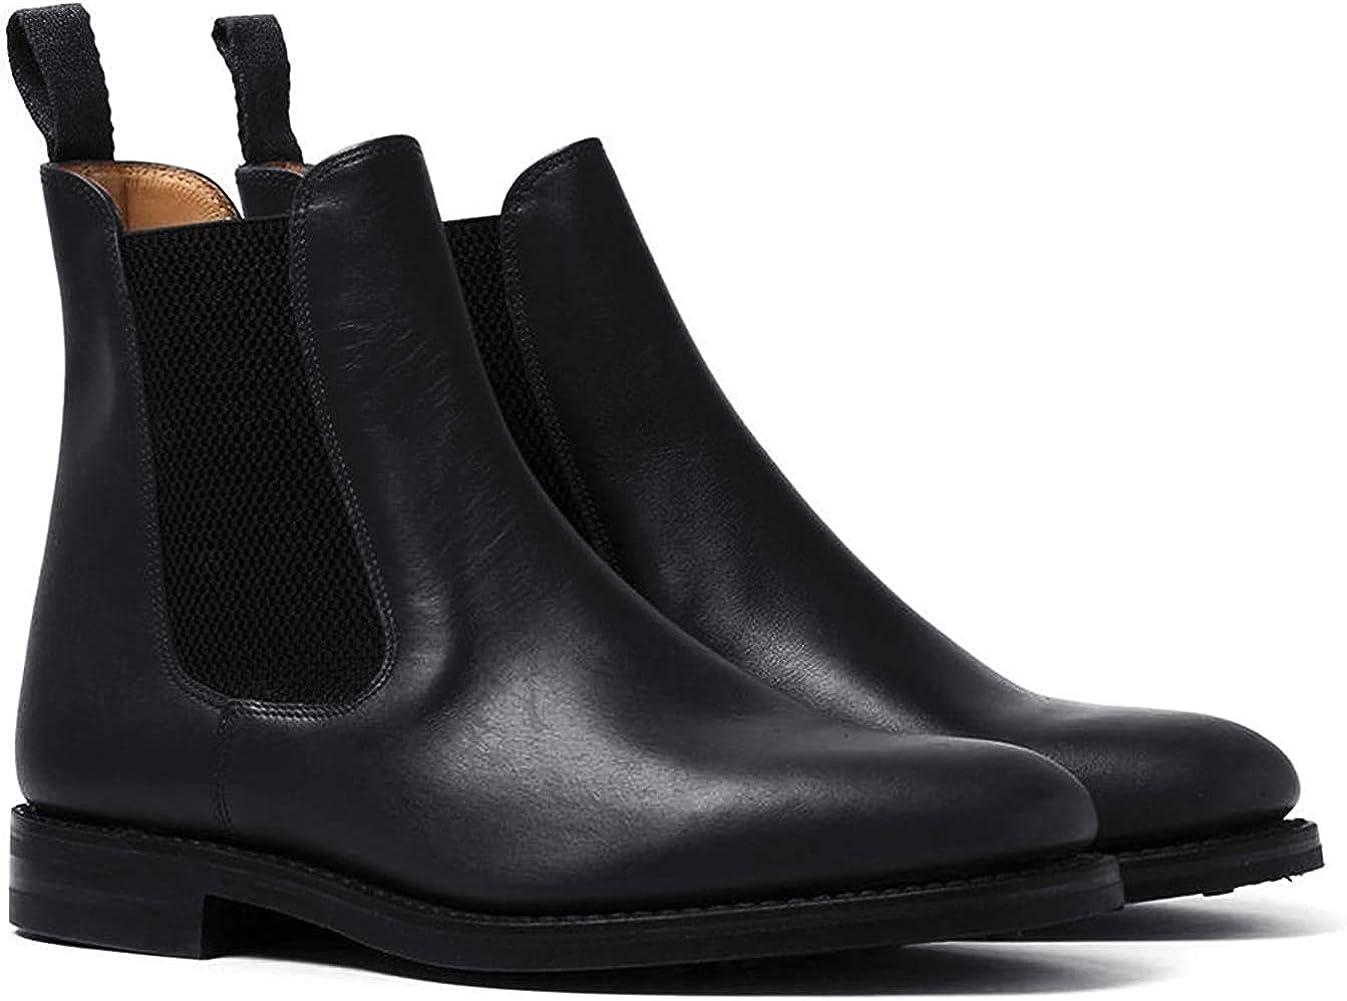 Loake Mens Blenheim Leather Black Boots